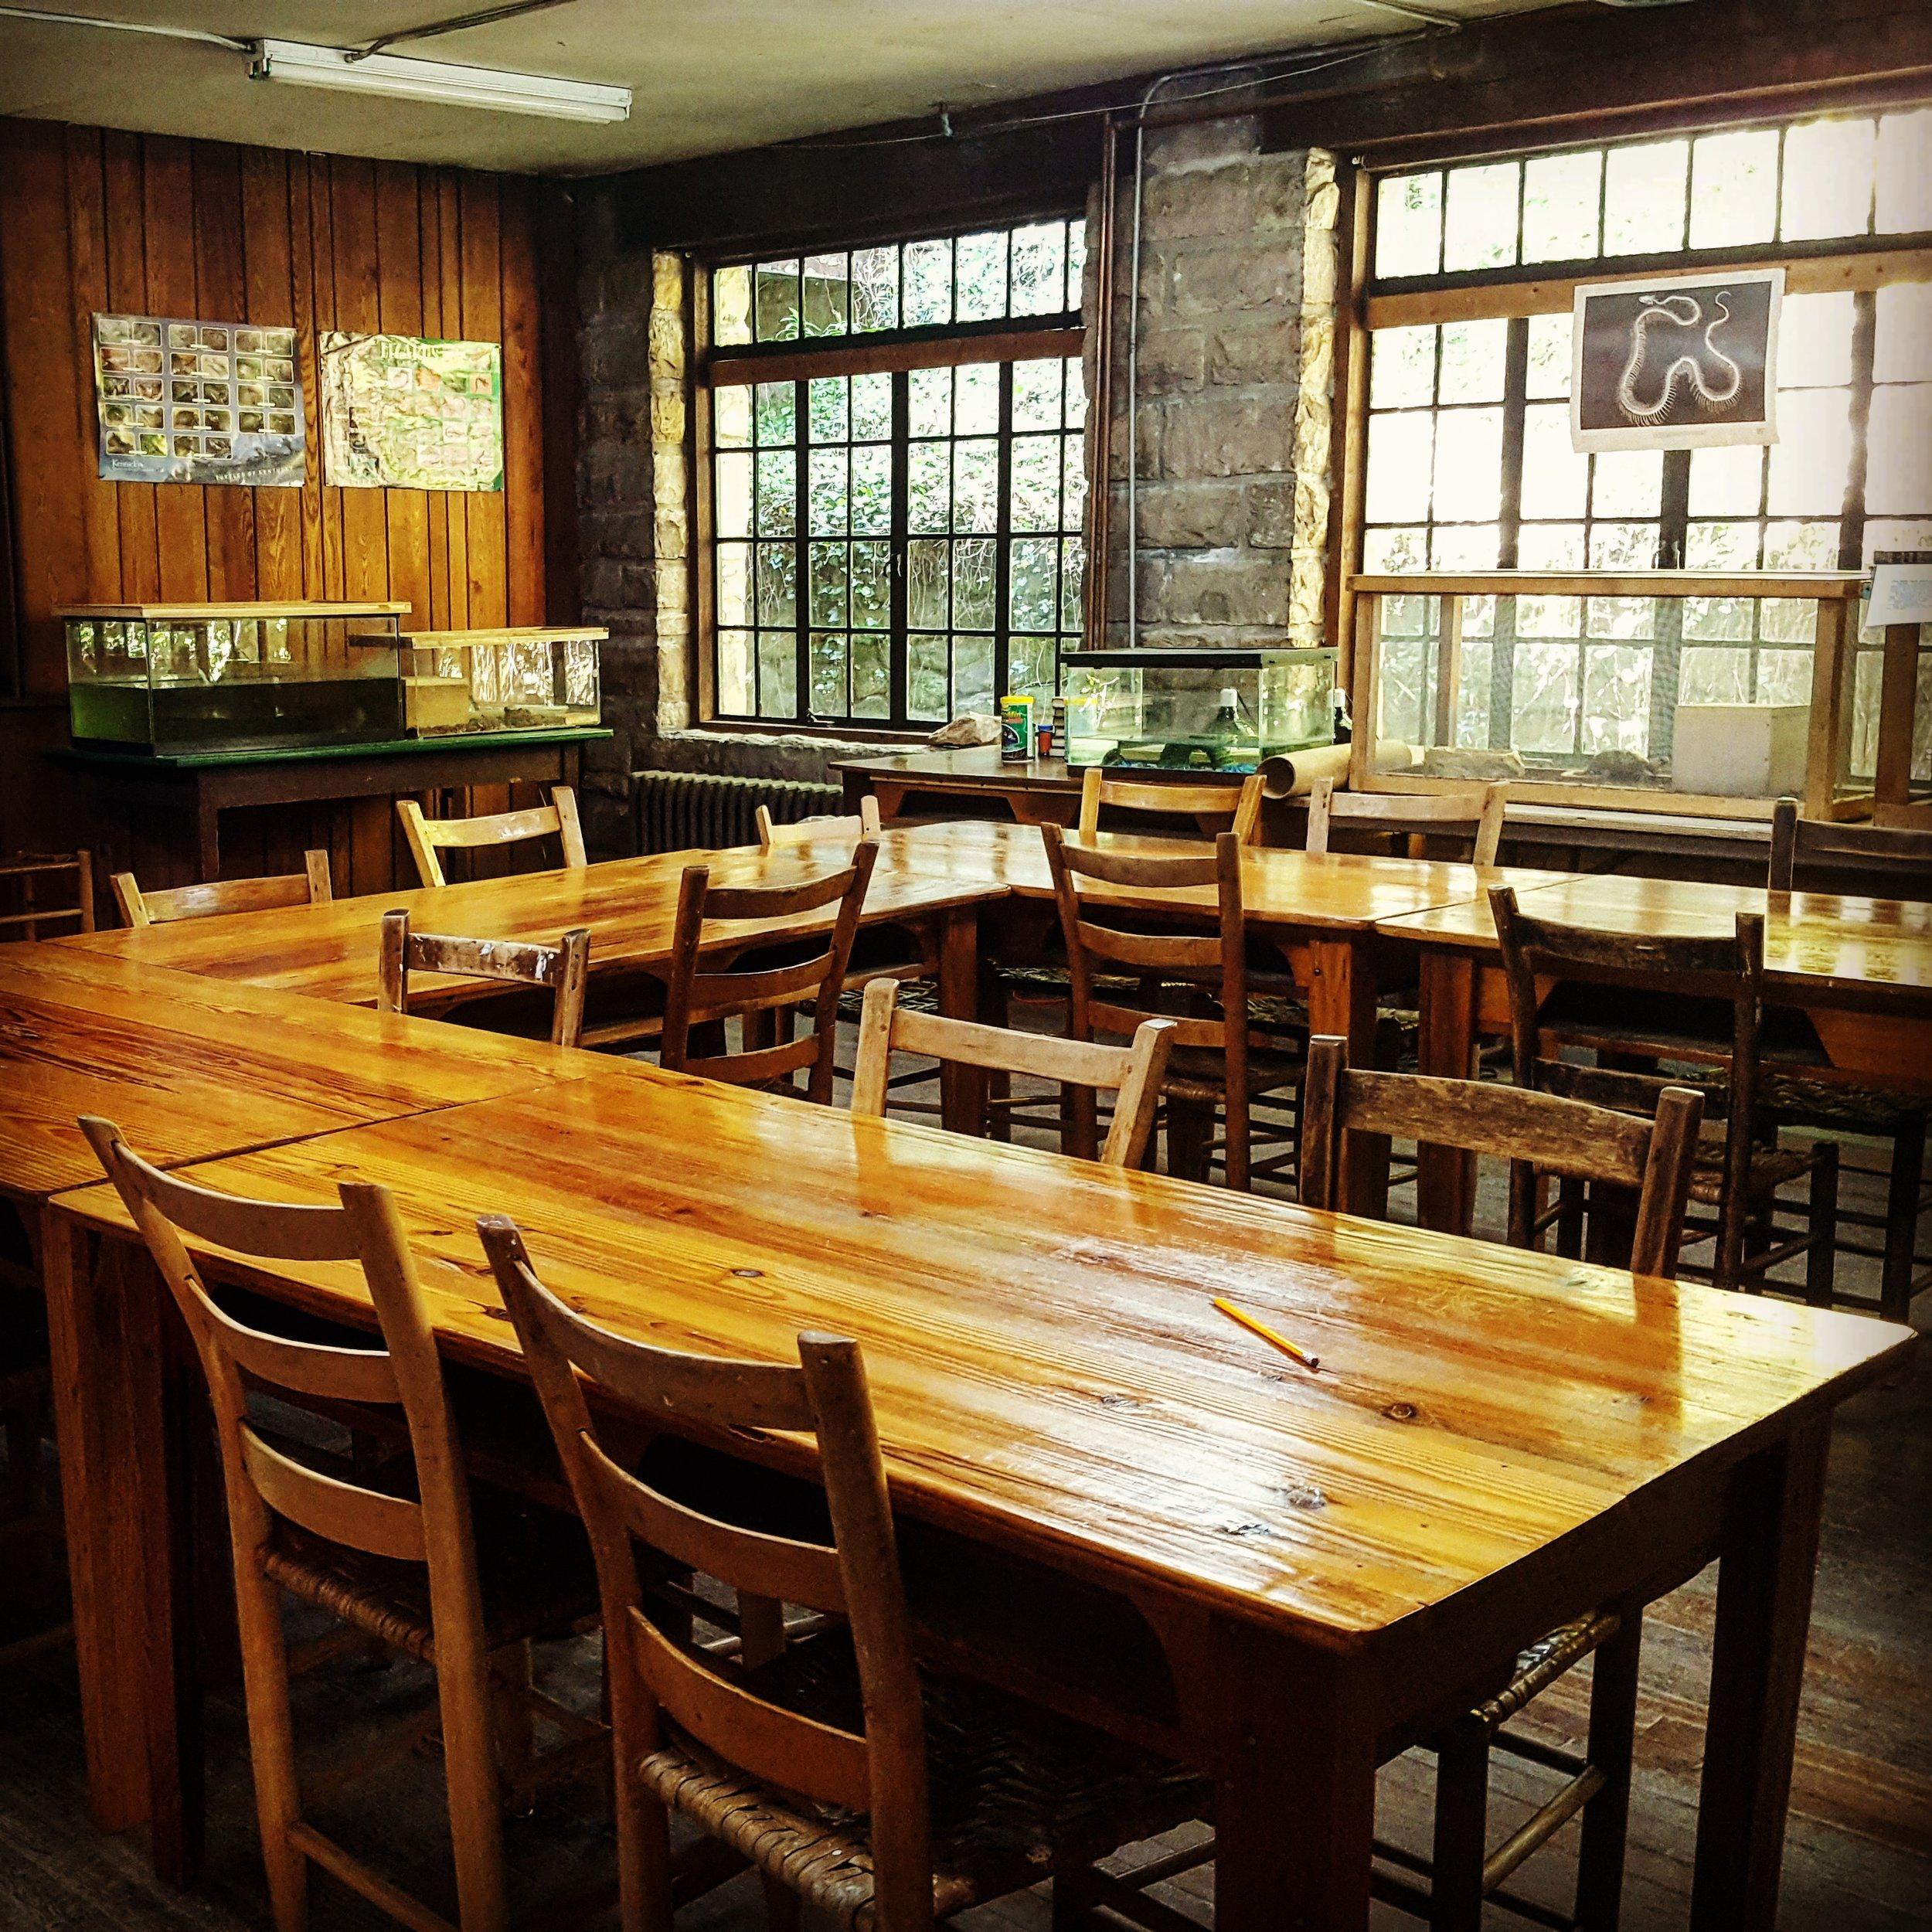 Historic Classrooms